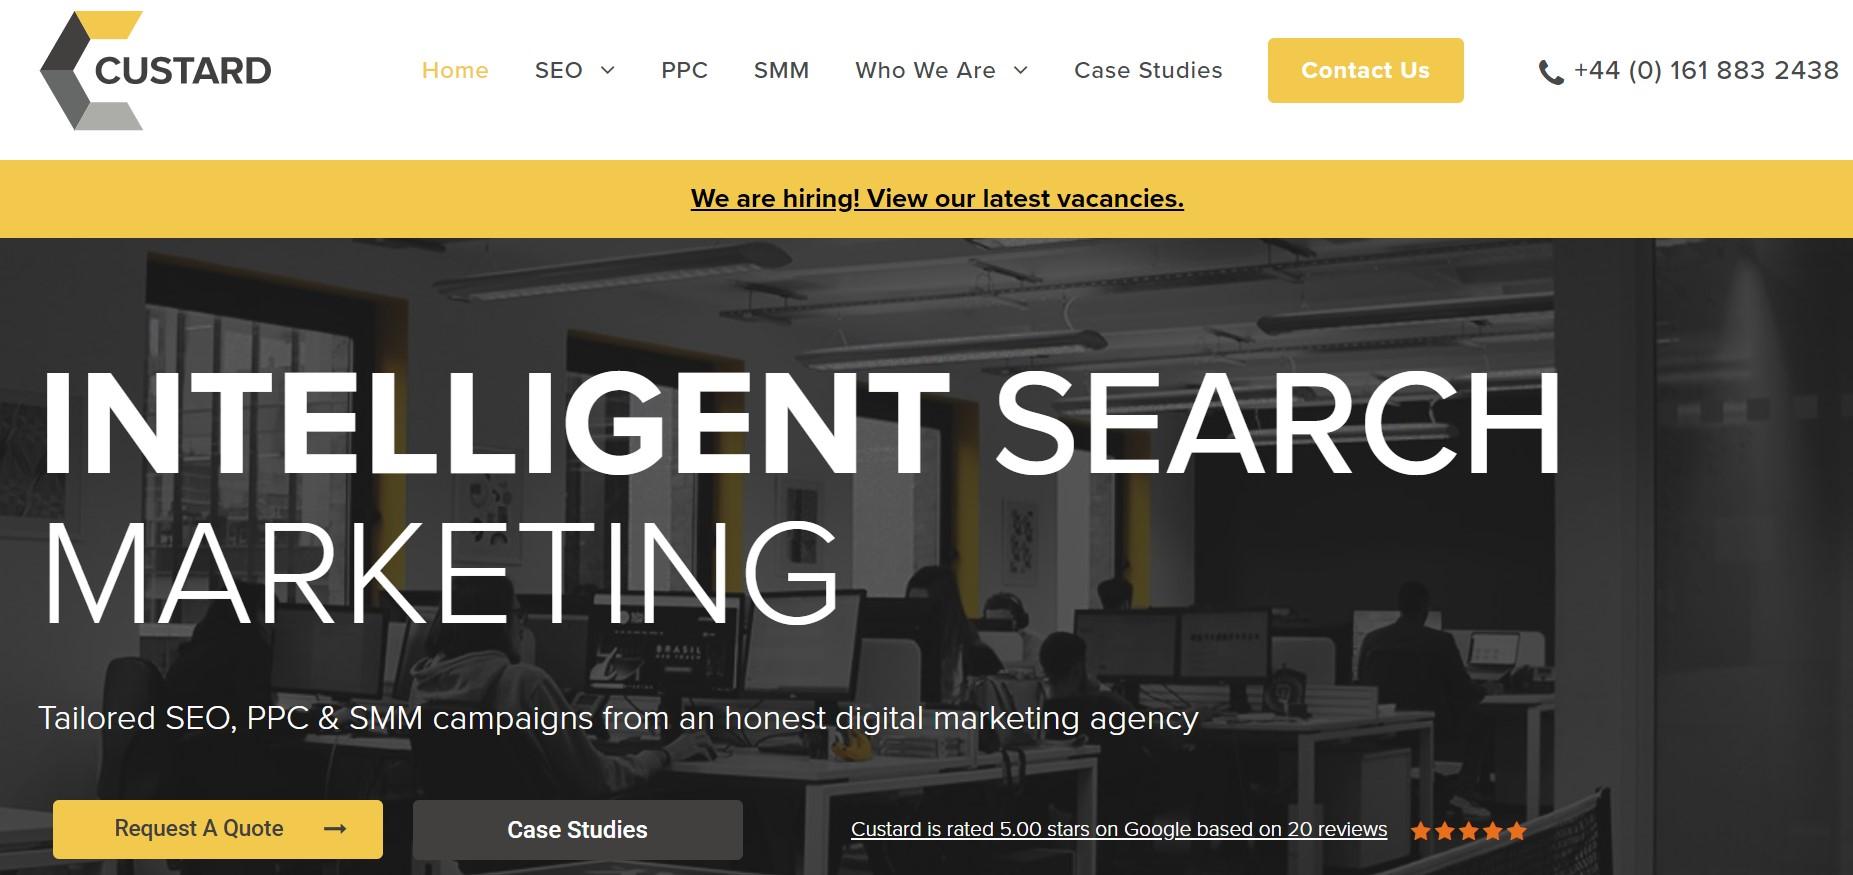 Custard Online Marketing seo agency